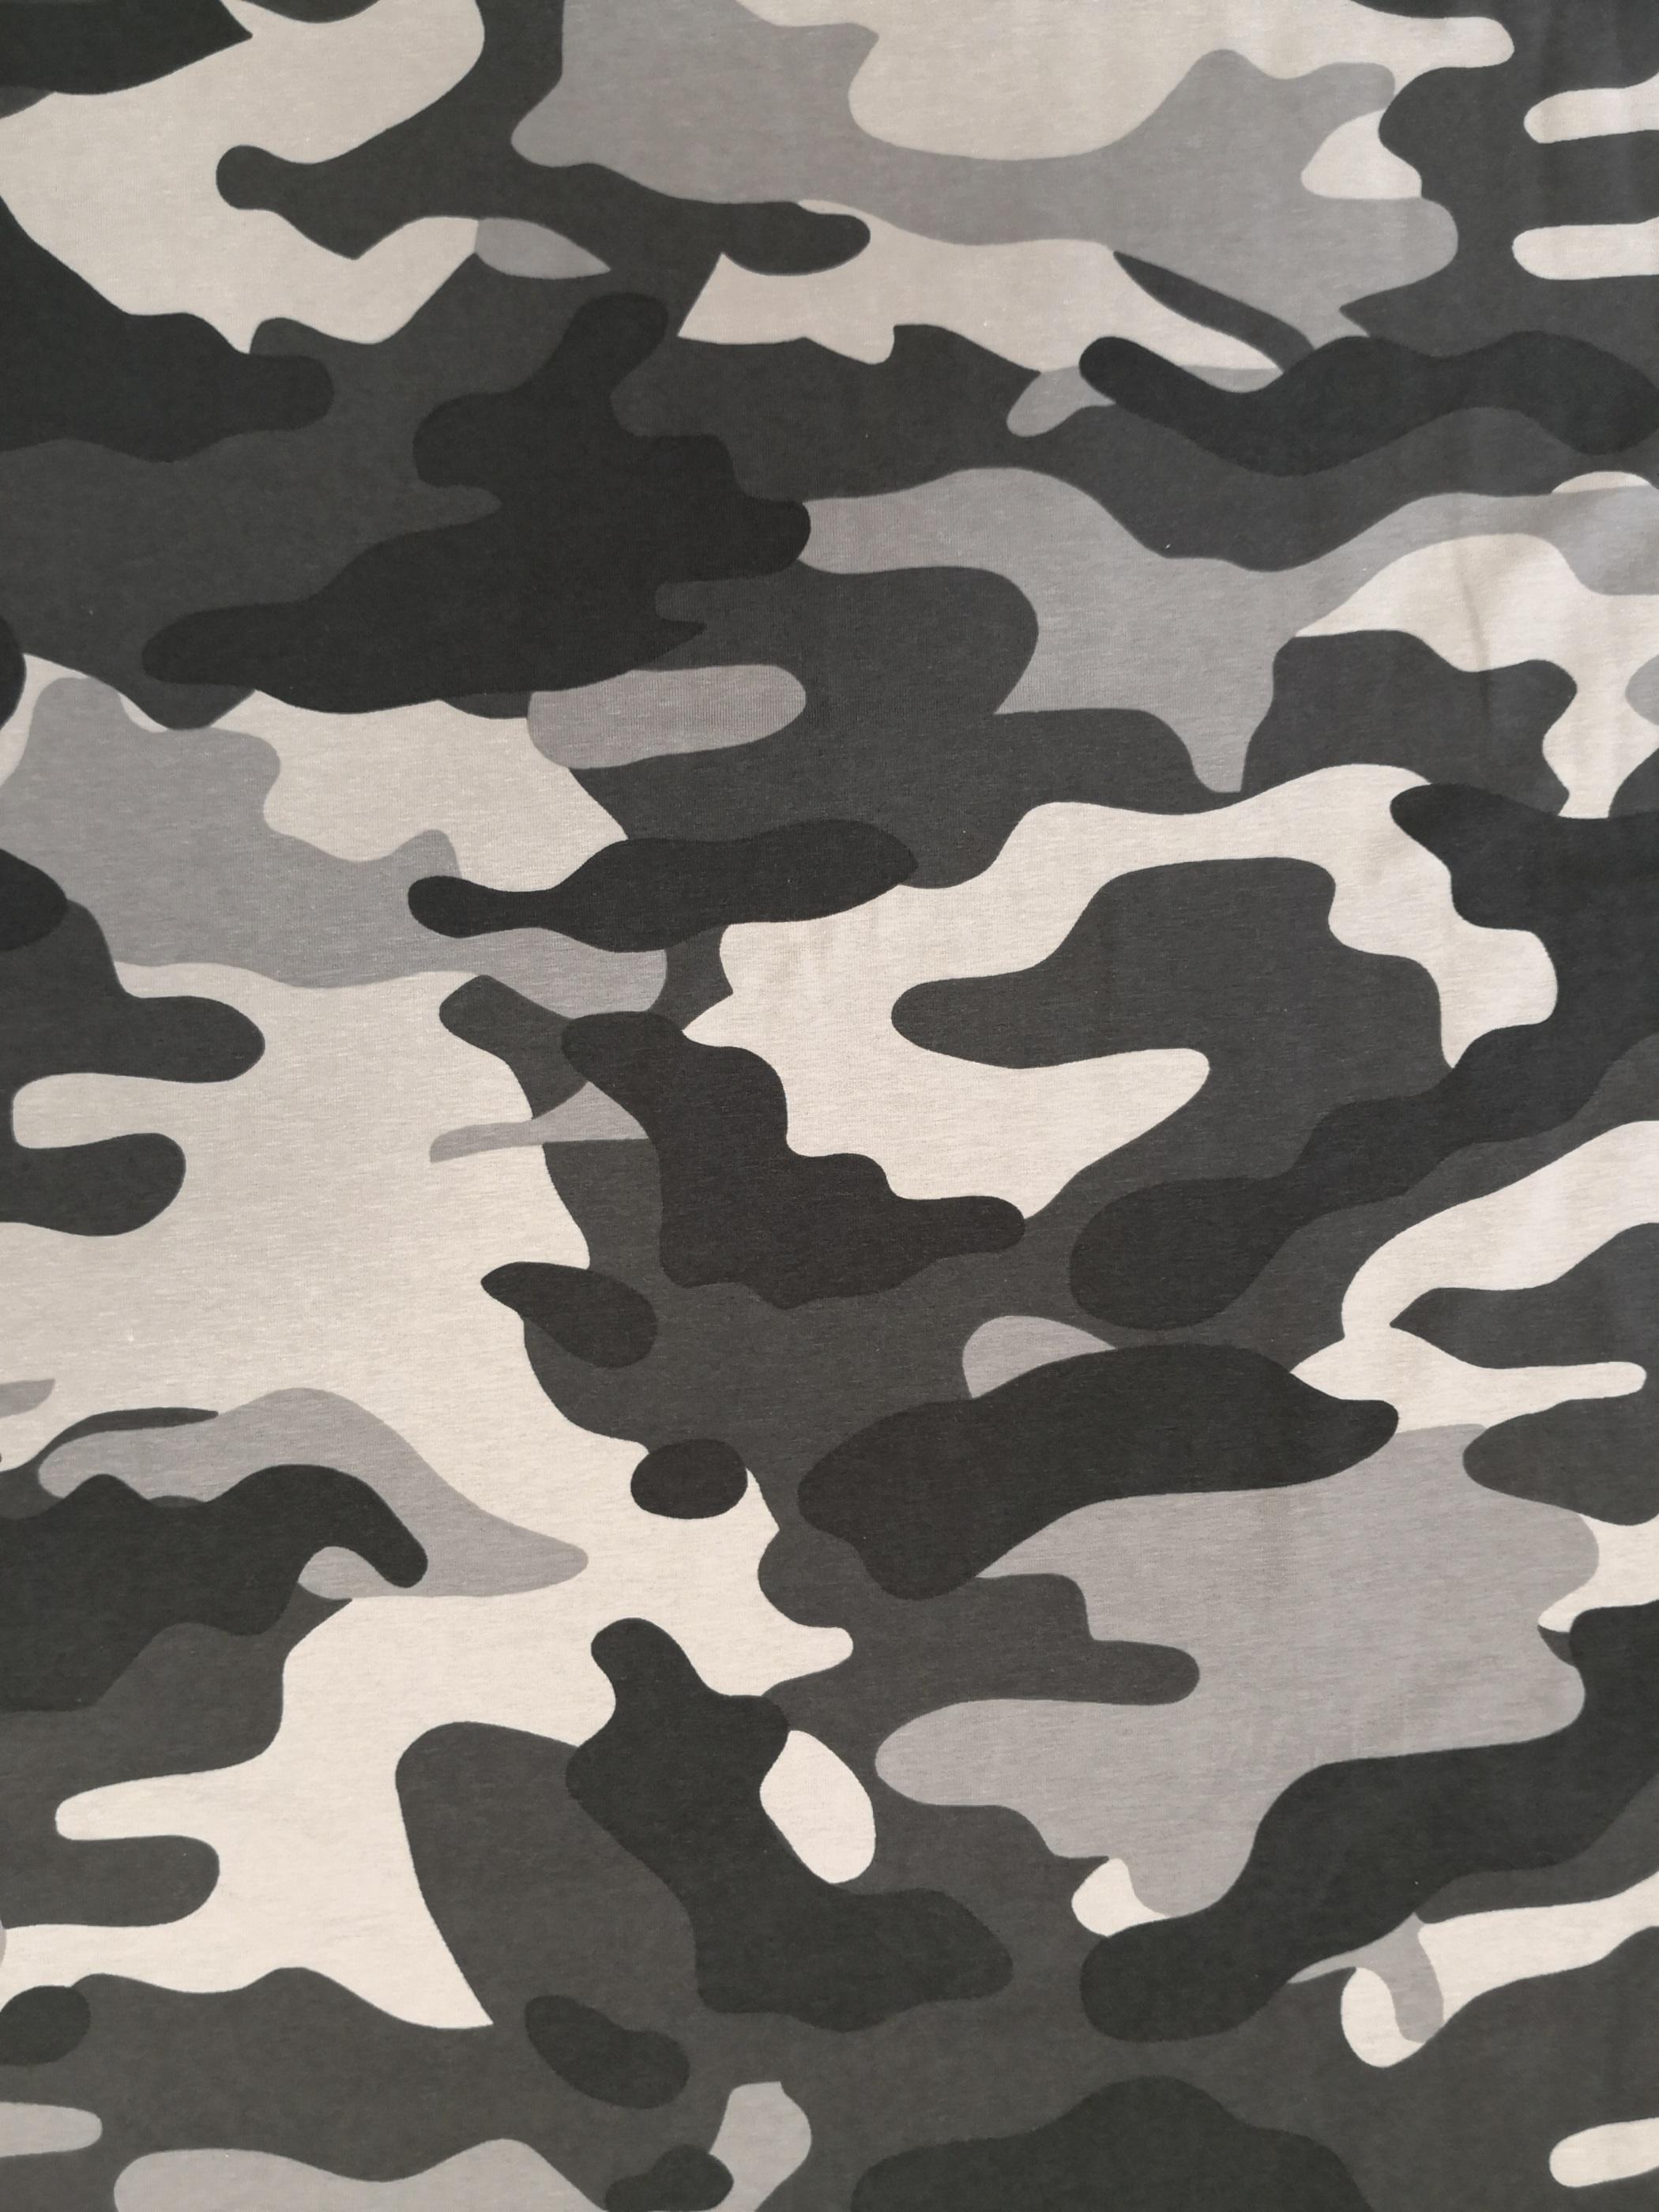 Navy, tyglust, tyg, trikå, mode, sy, sömnad, textil design, metervara, tygaffär